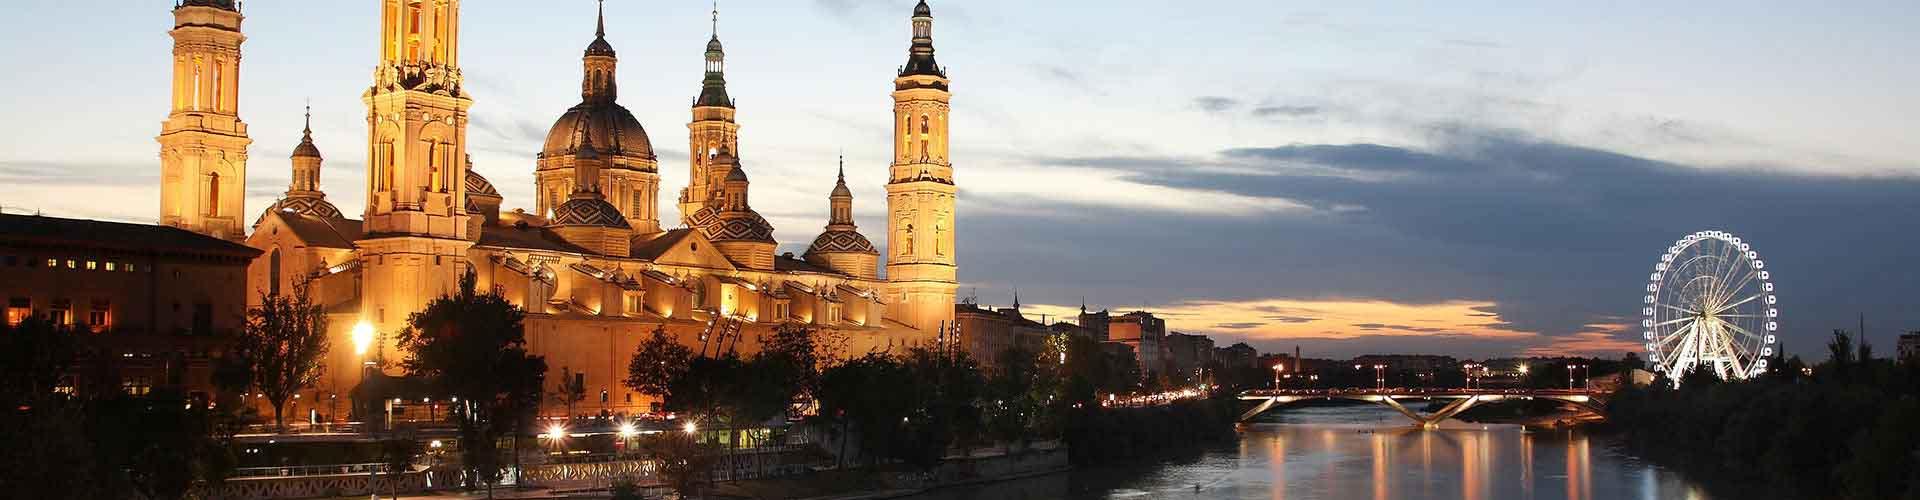 Zaragoza - Albergues Juveniles  en Zaragoza. Mapas de Zaragoza, Fotos y Comentarios para cada Albergue Juvenil en Zaragoza.